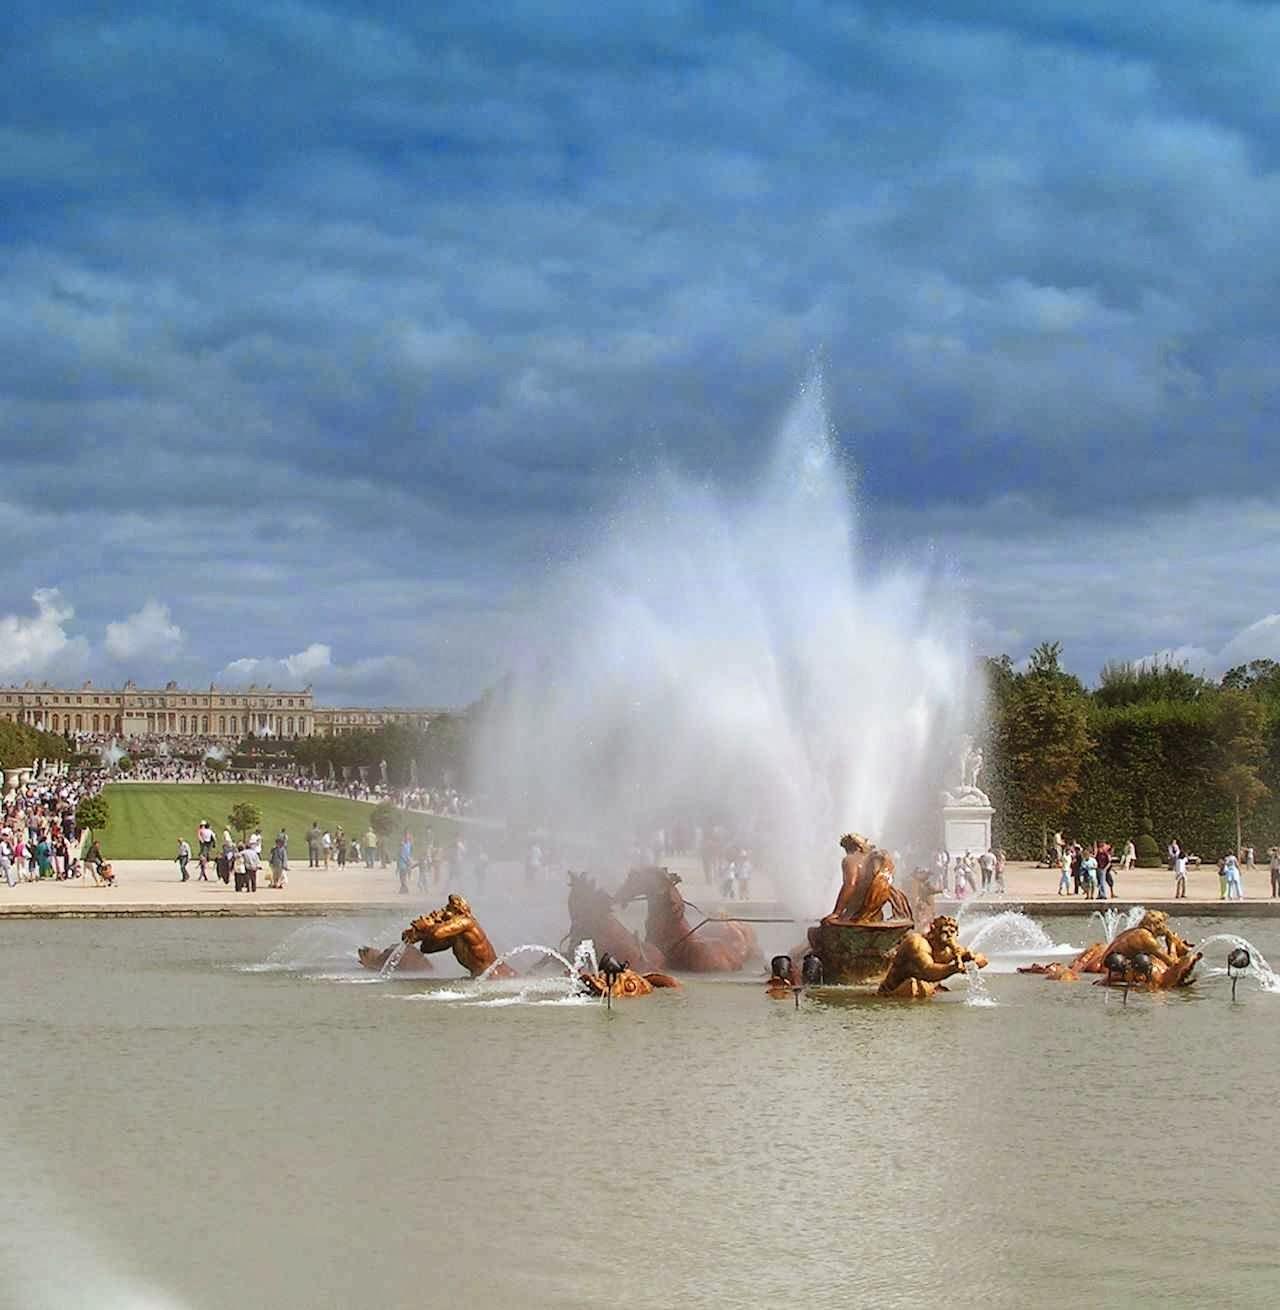 Fonte de Apolo em Versailles: armonia de todos os elementos naturais